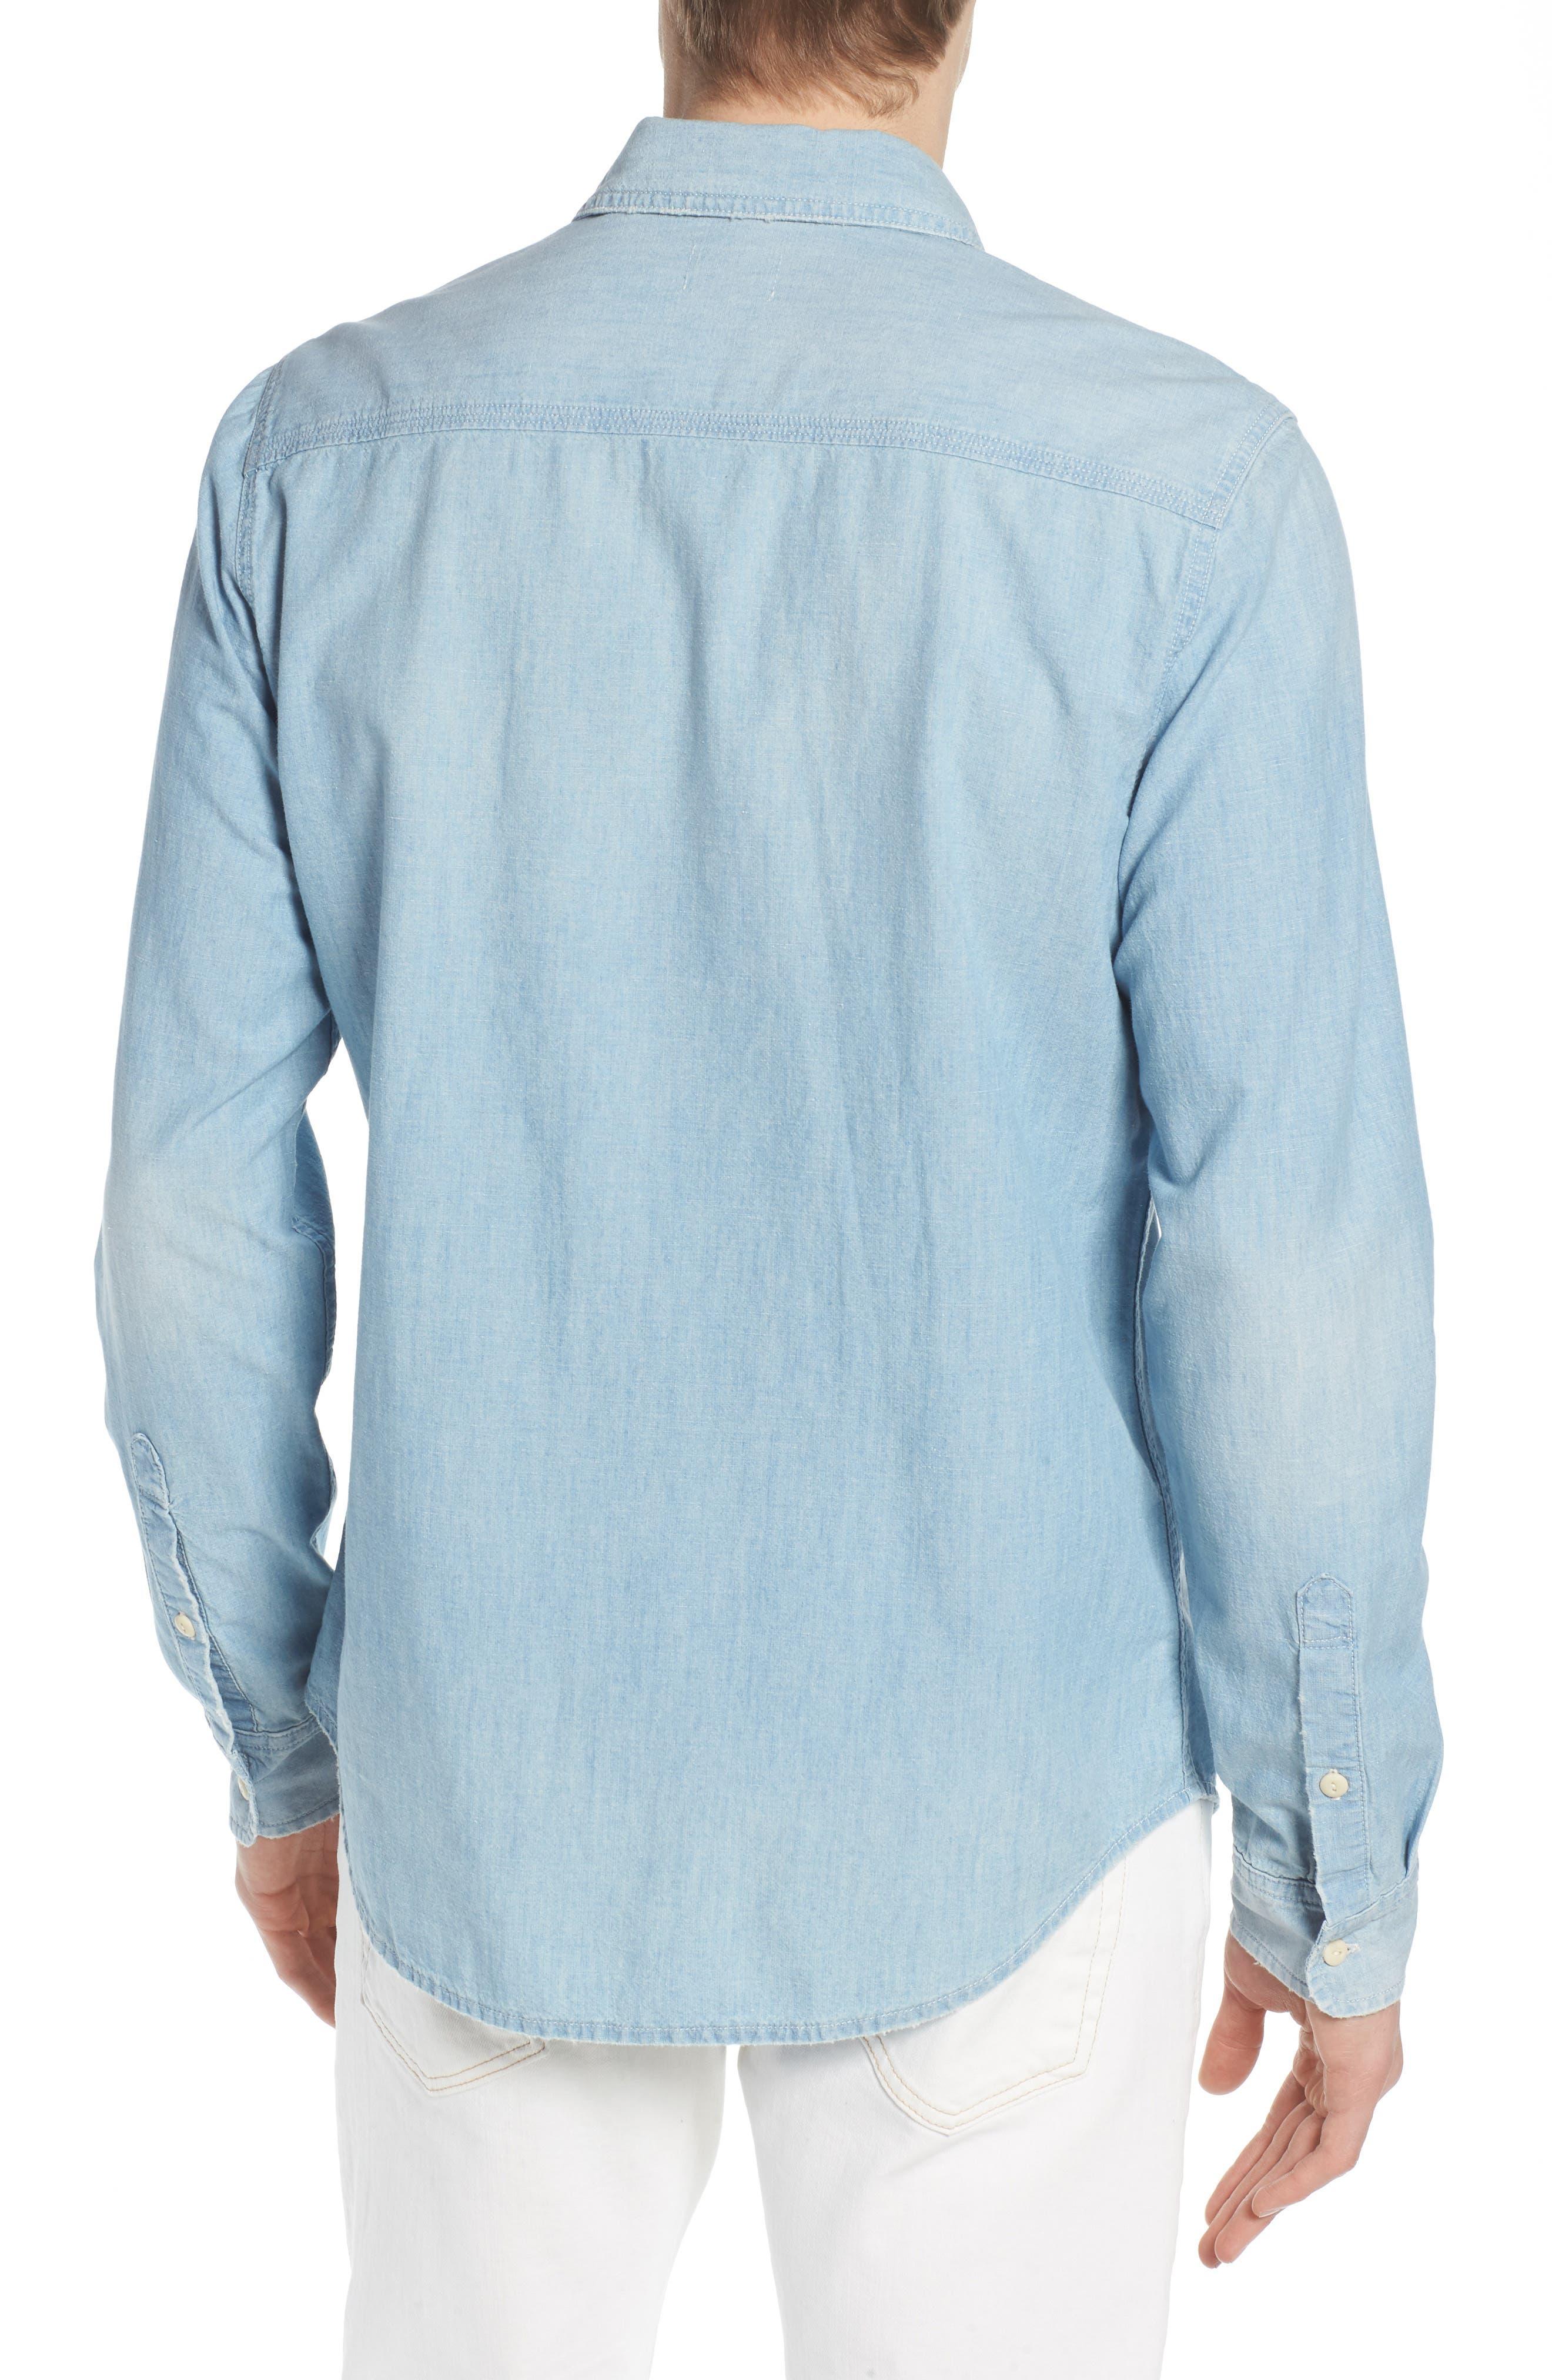 Benning Regular Fit Sport Shirt,                             Alternate thumbnail 3, color,                             Roadstead